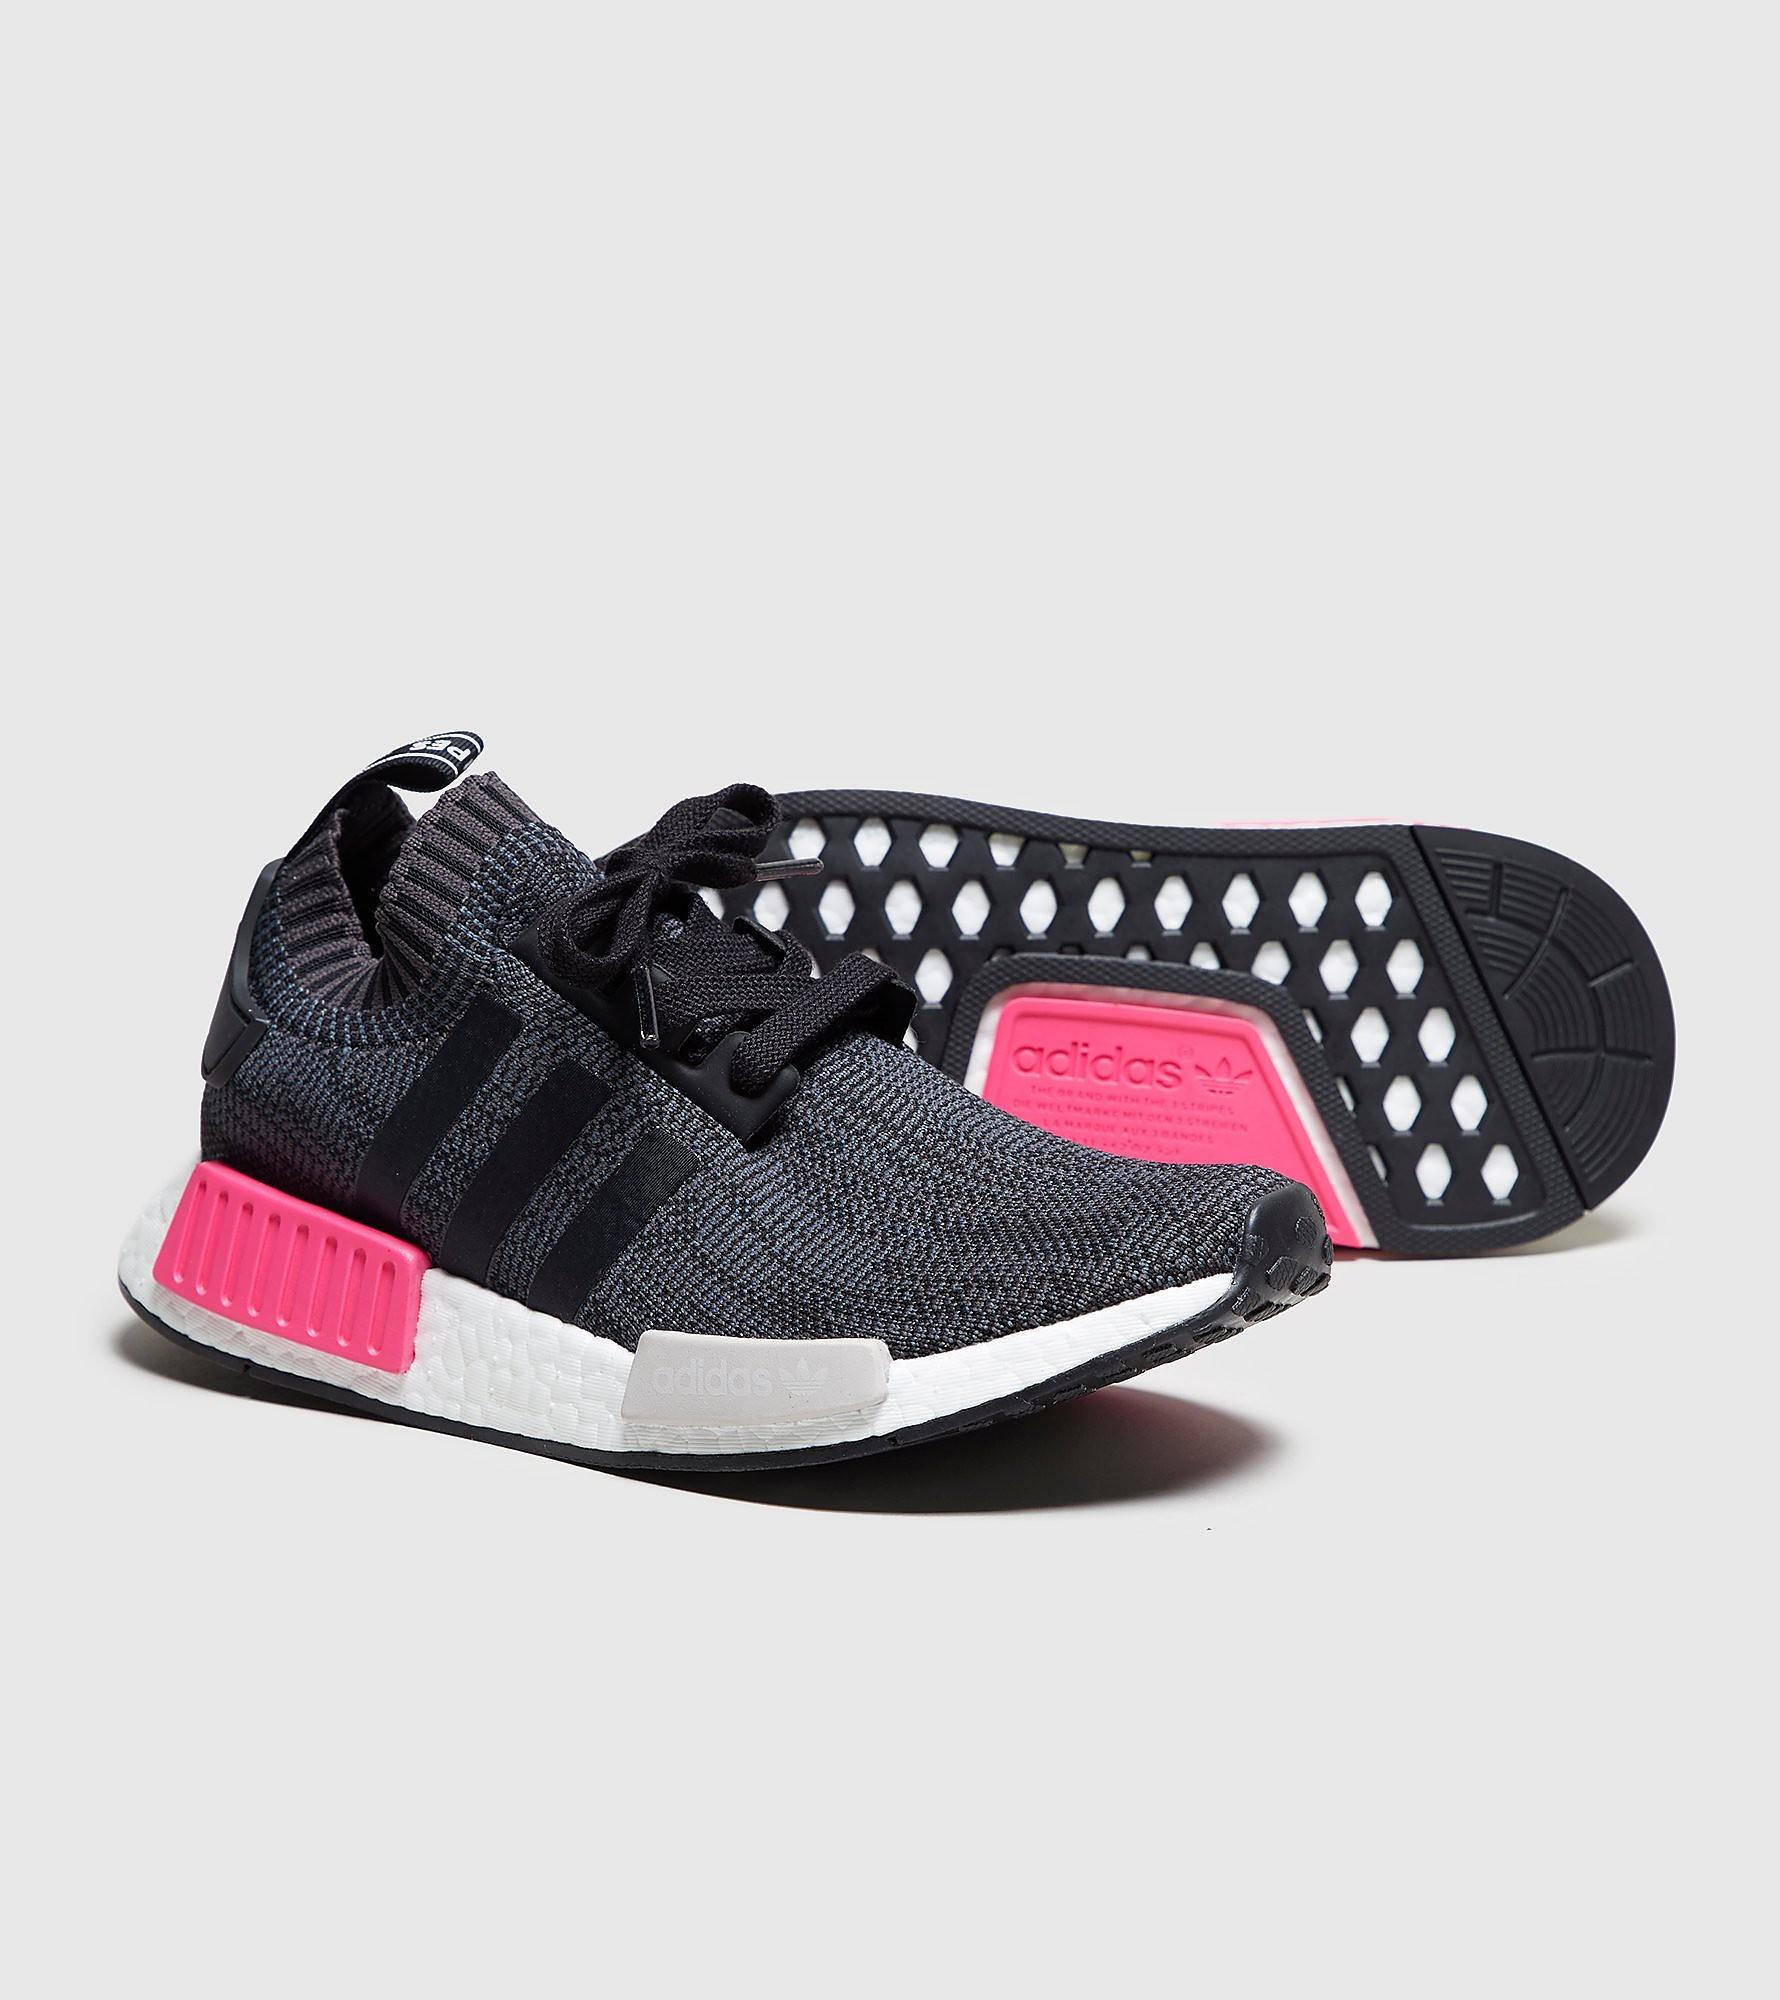 adidas Originals NMD_R1 Primeknit Women's